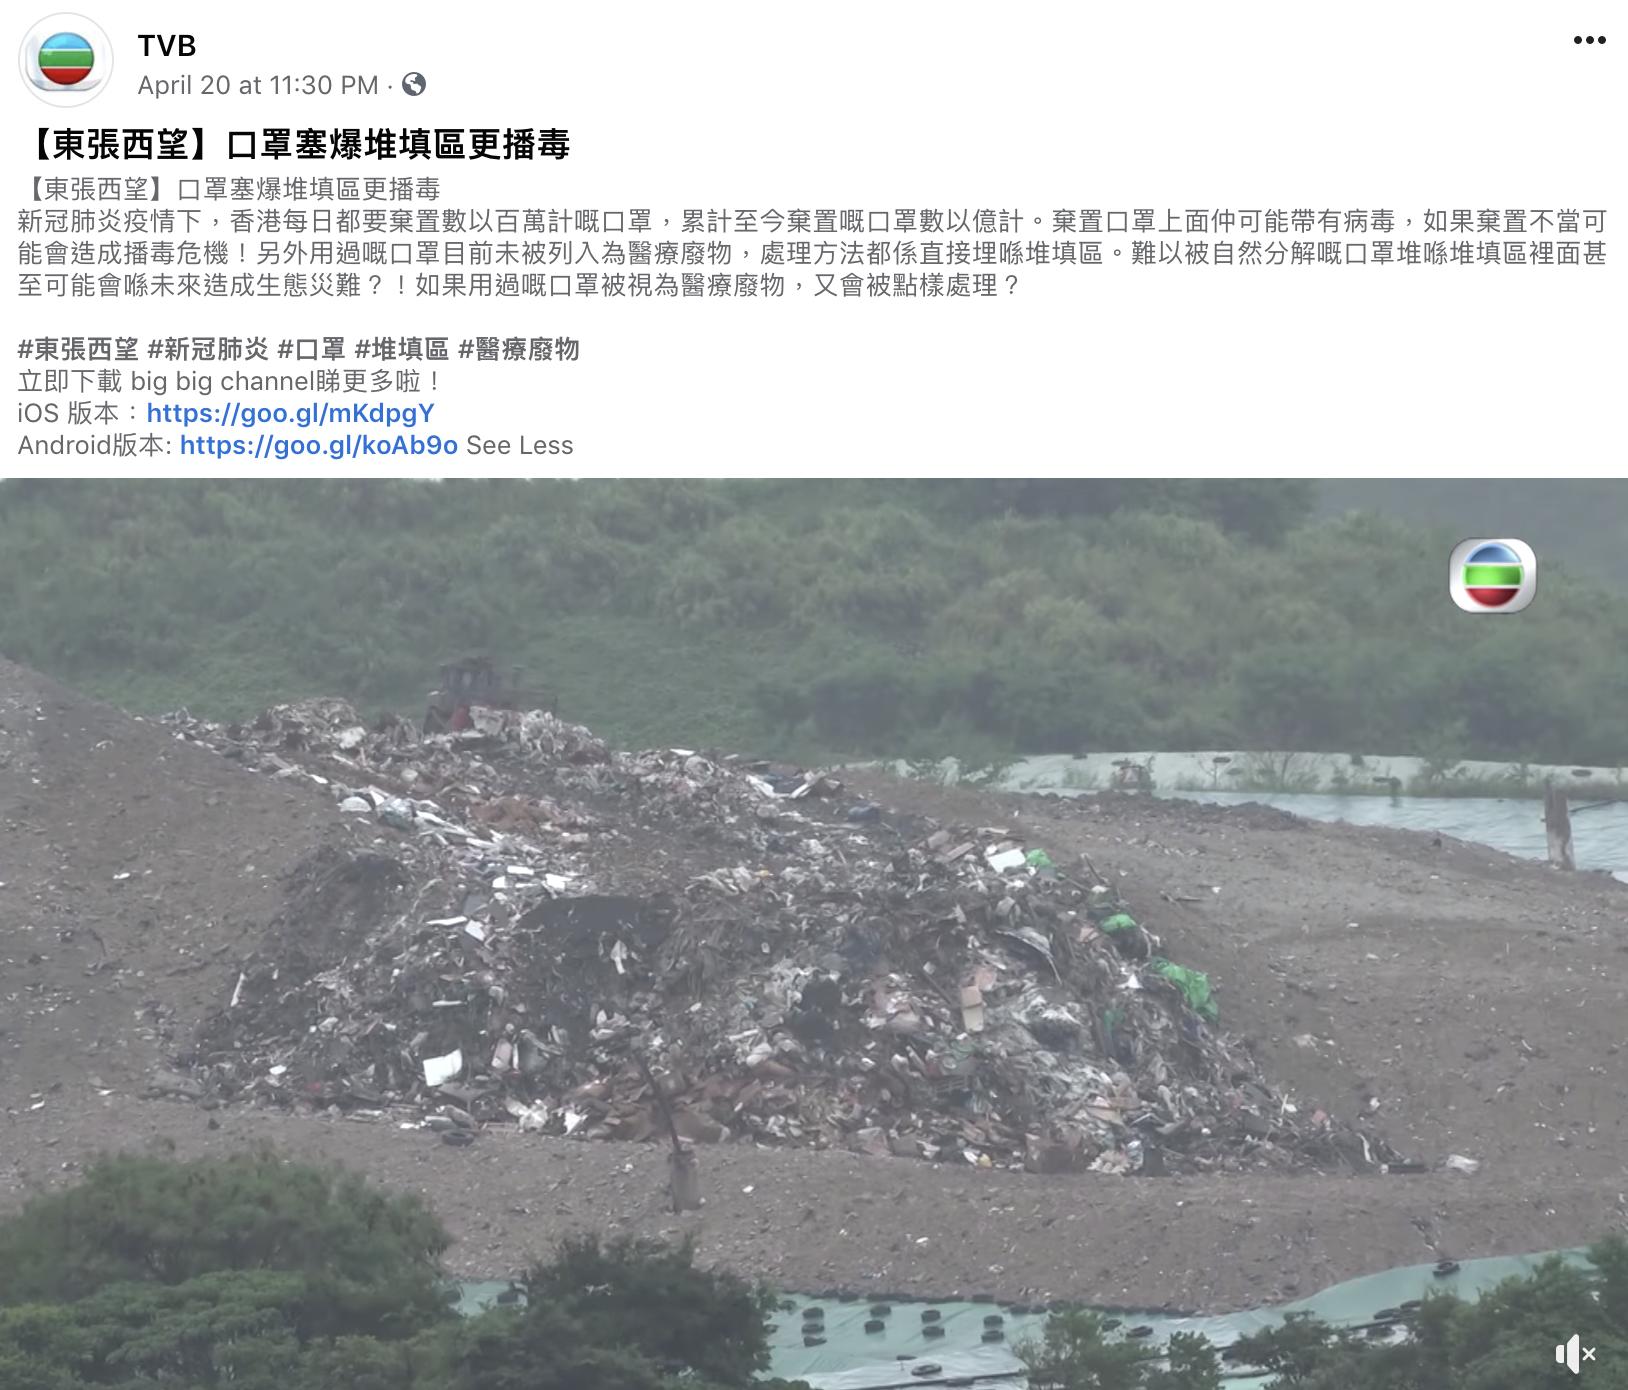 TVB / 東張西望 -  April 20, 2020